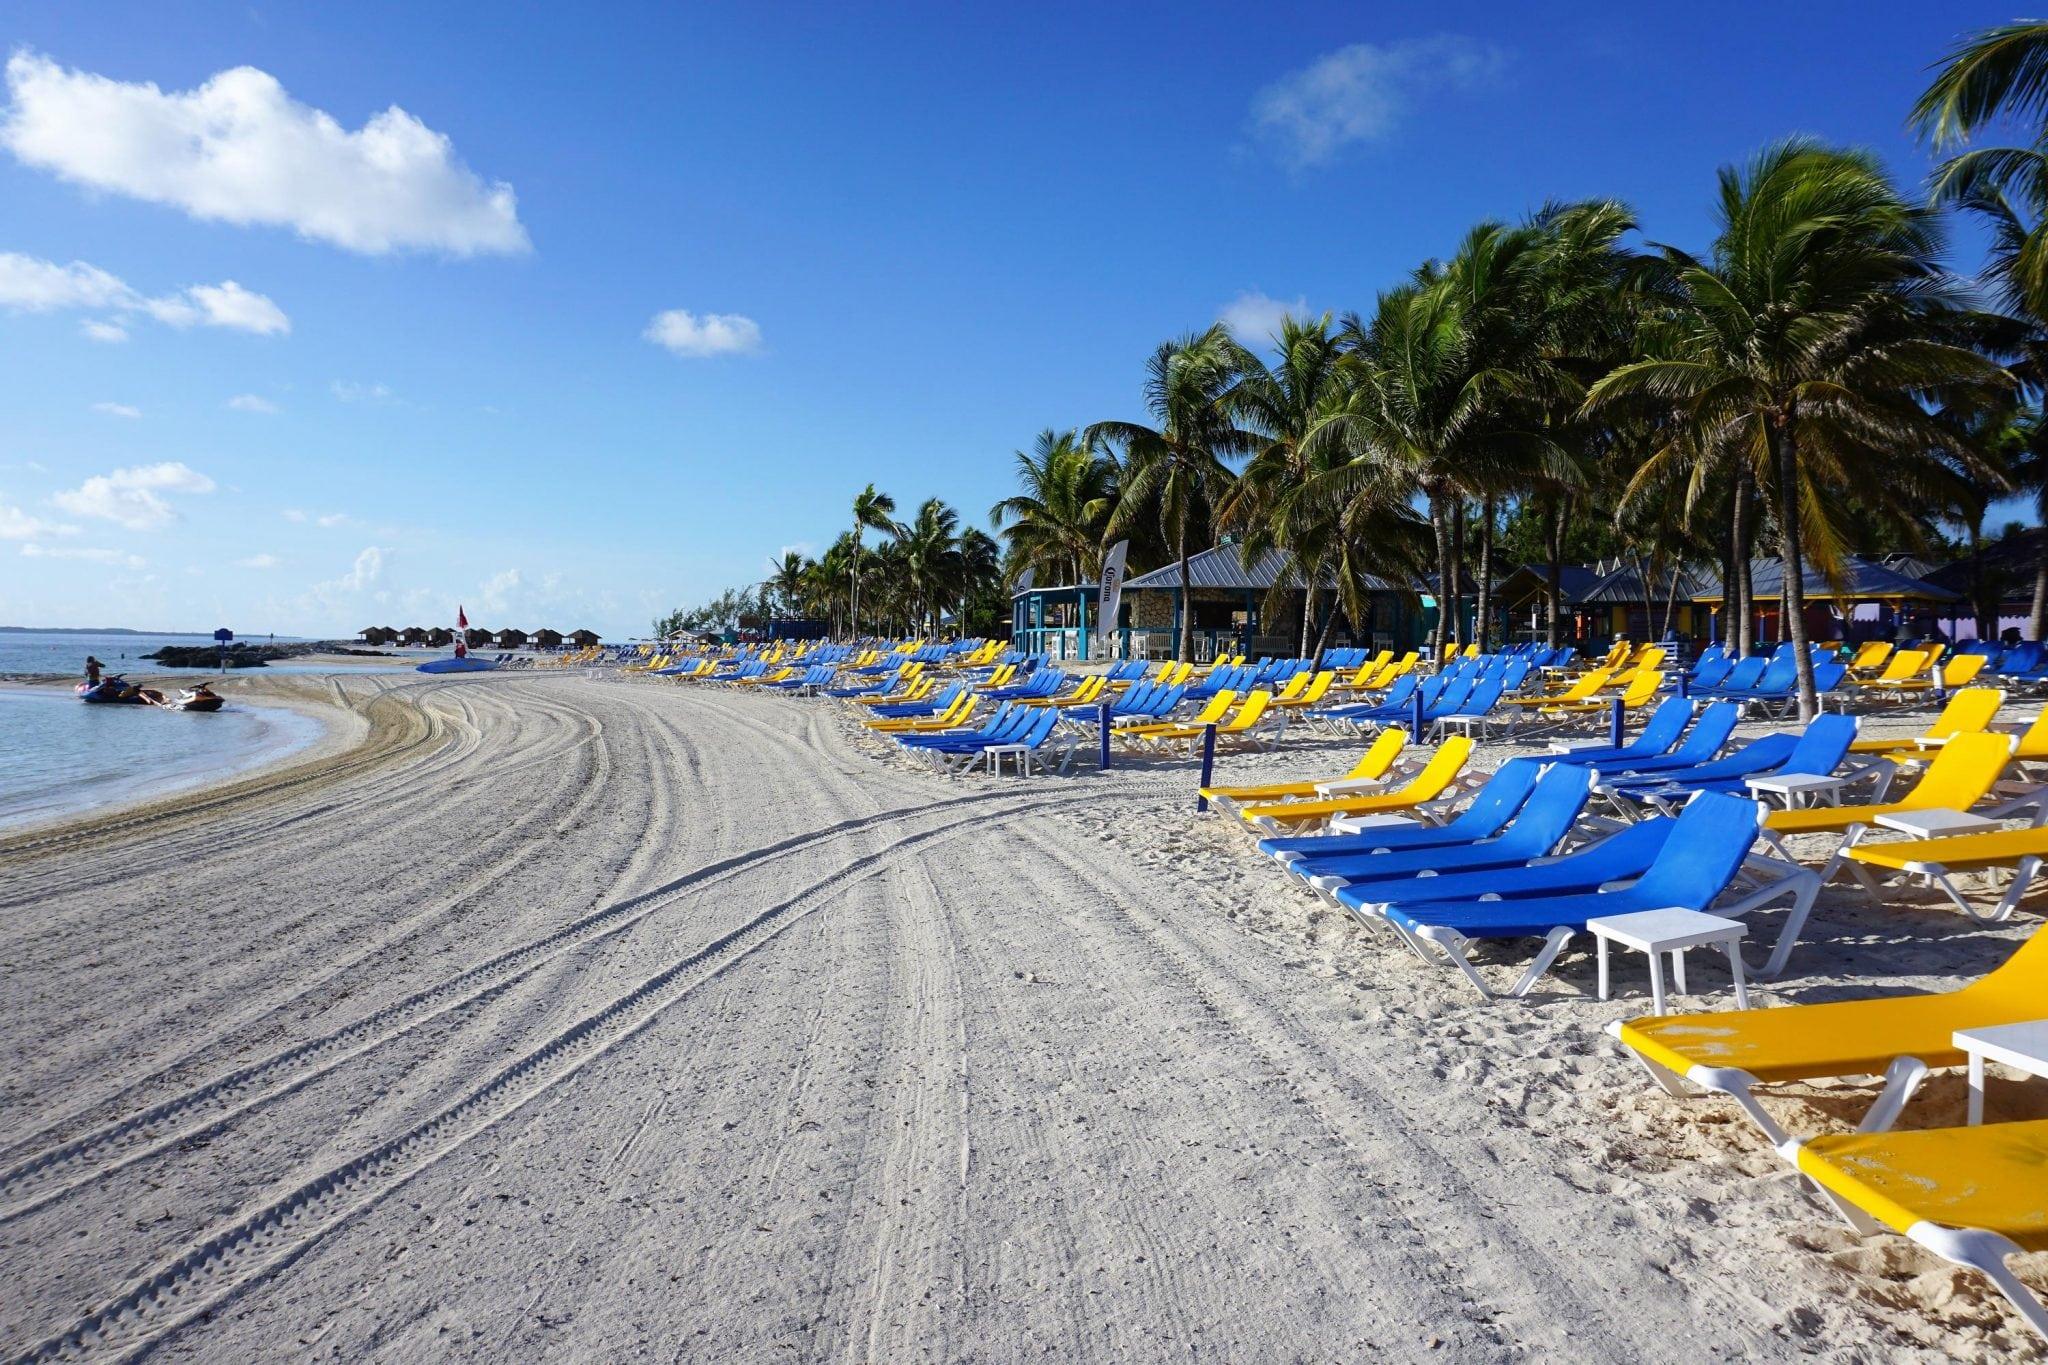 BEach on CocoCay, Bahamas